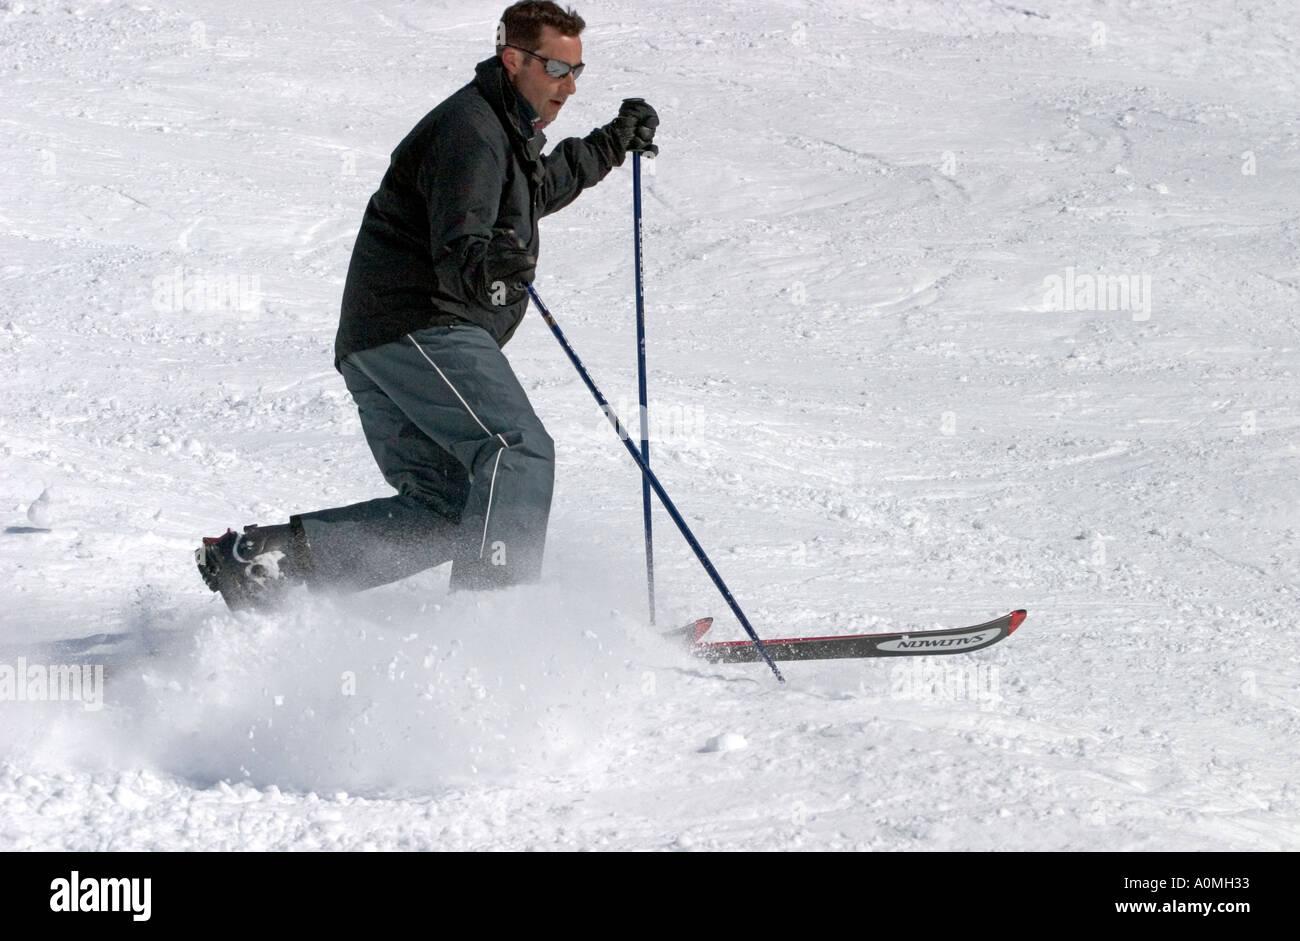 ski moving CROSS Country Skiing  - Stock Image